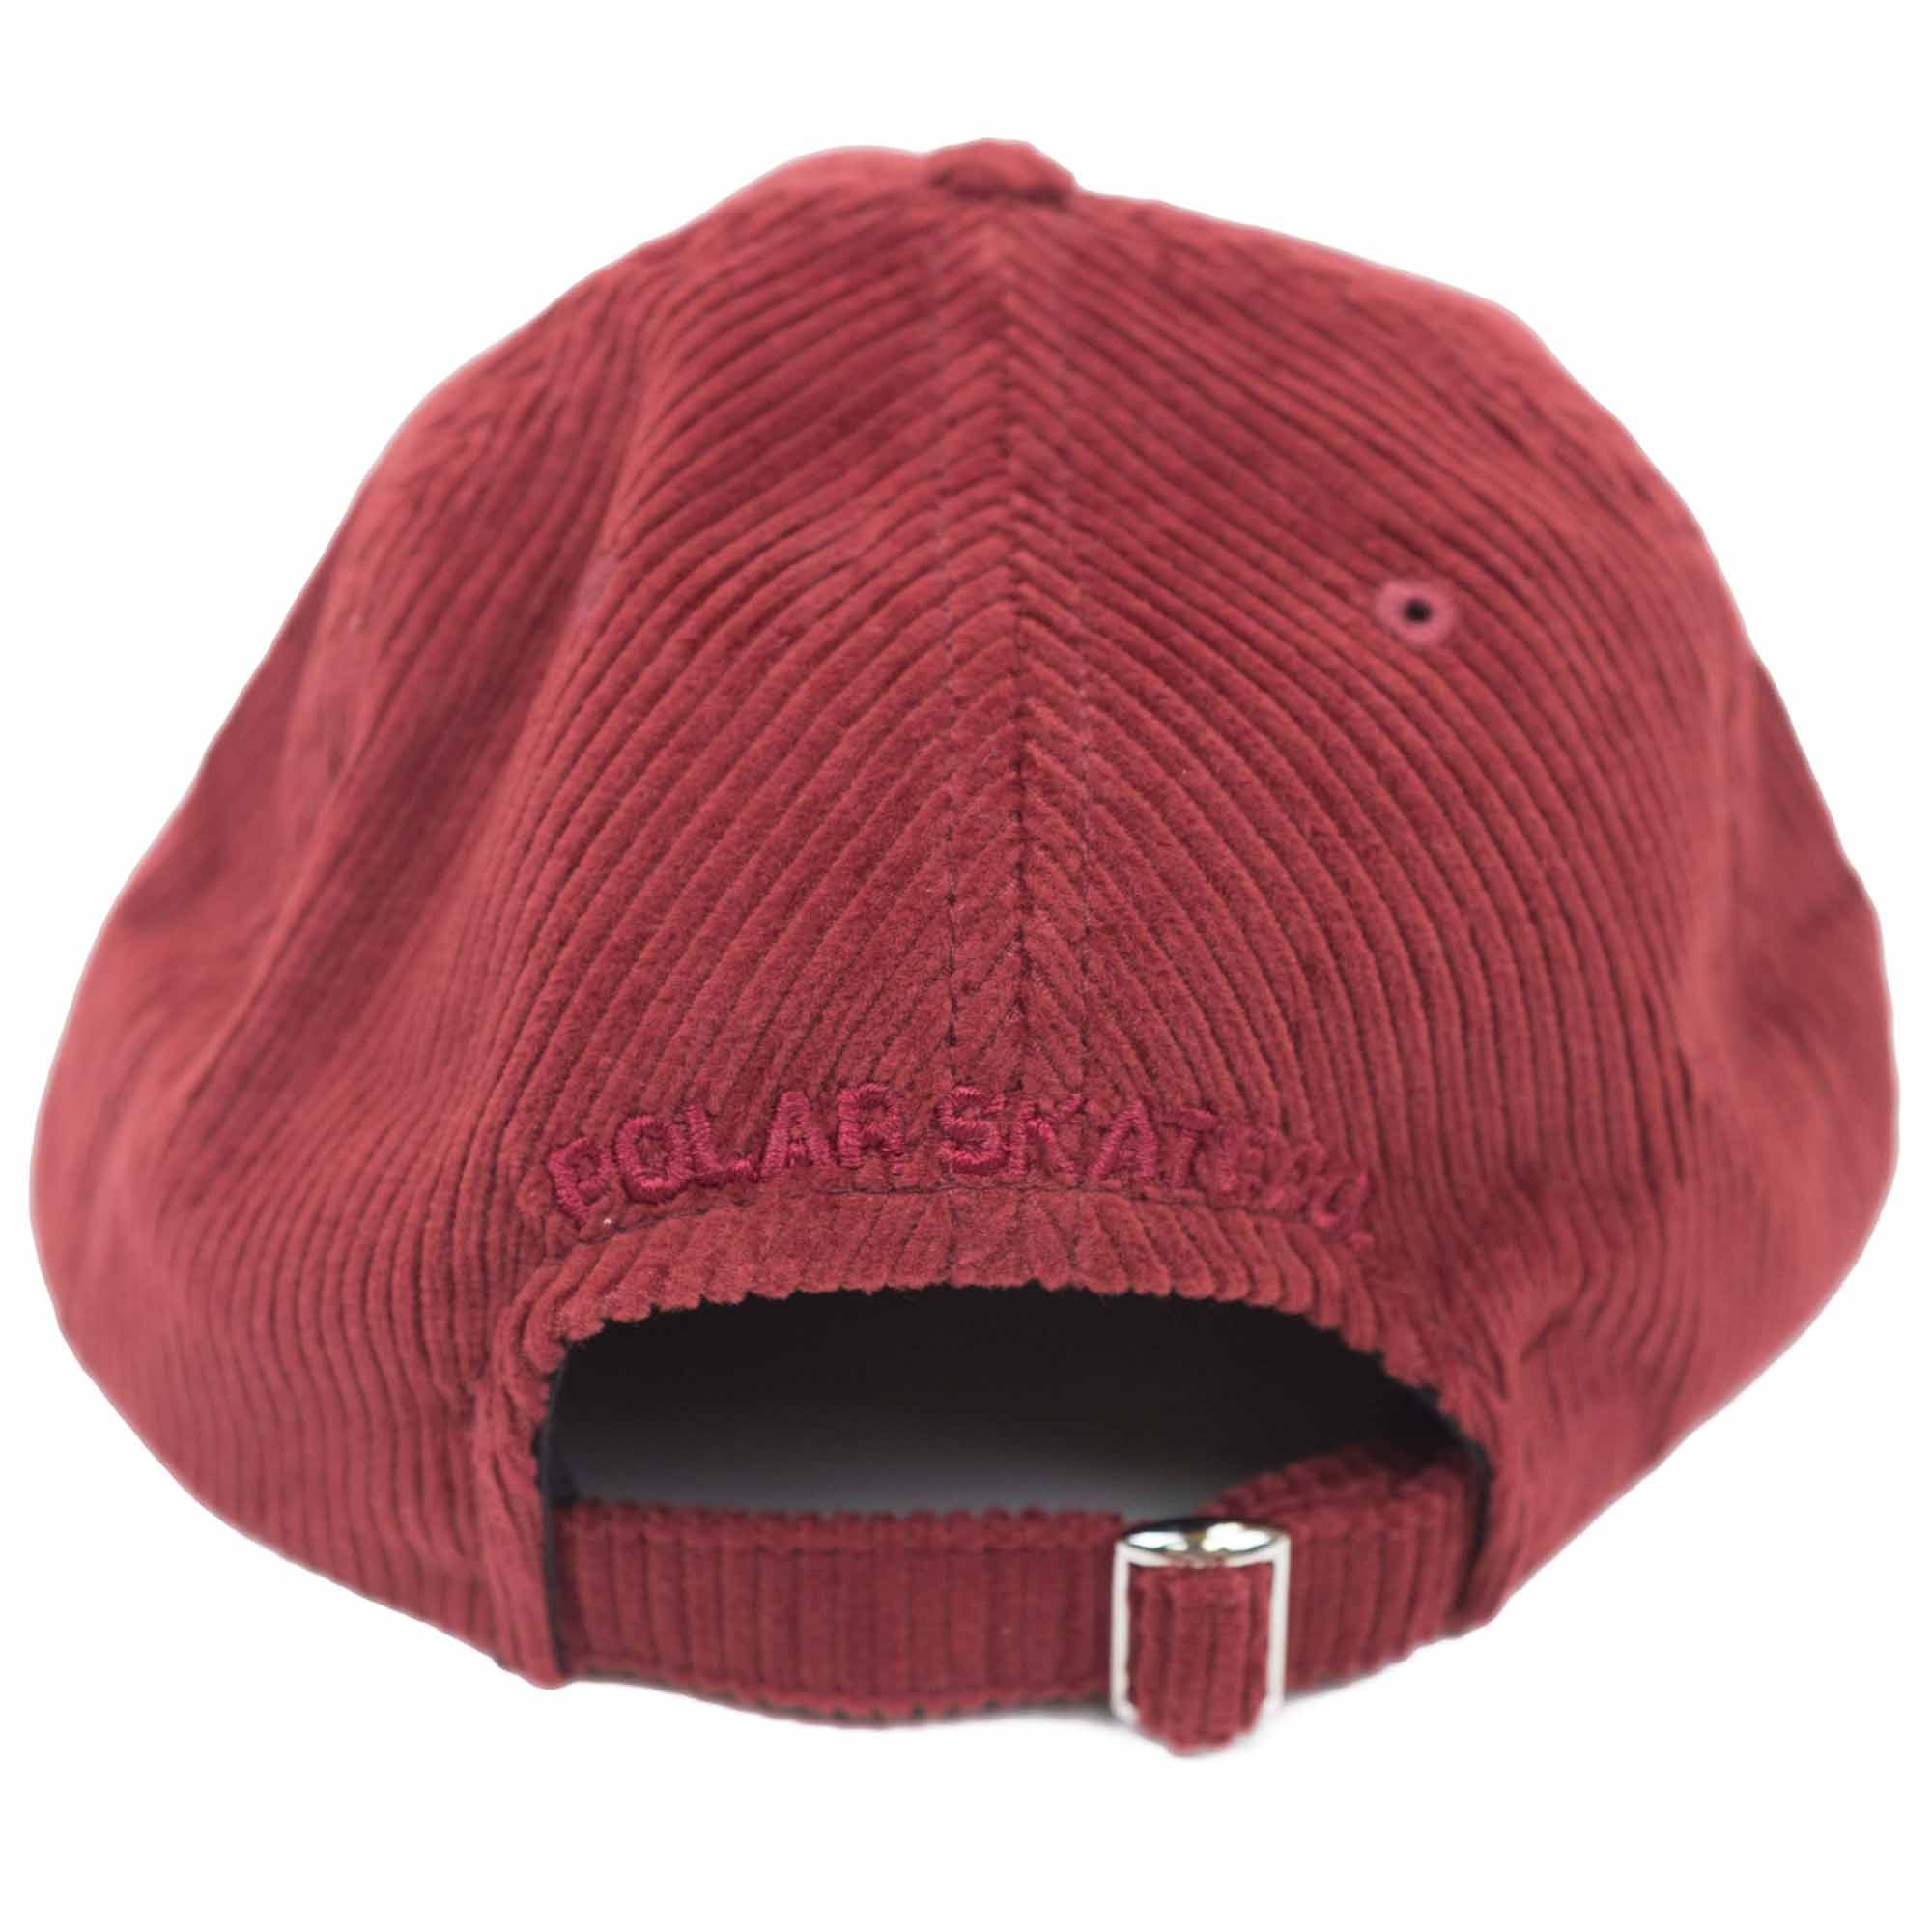 Polar Skate Co. Corduroy Cap - Red